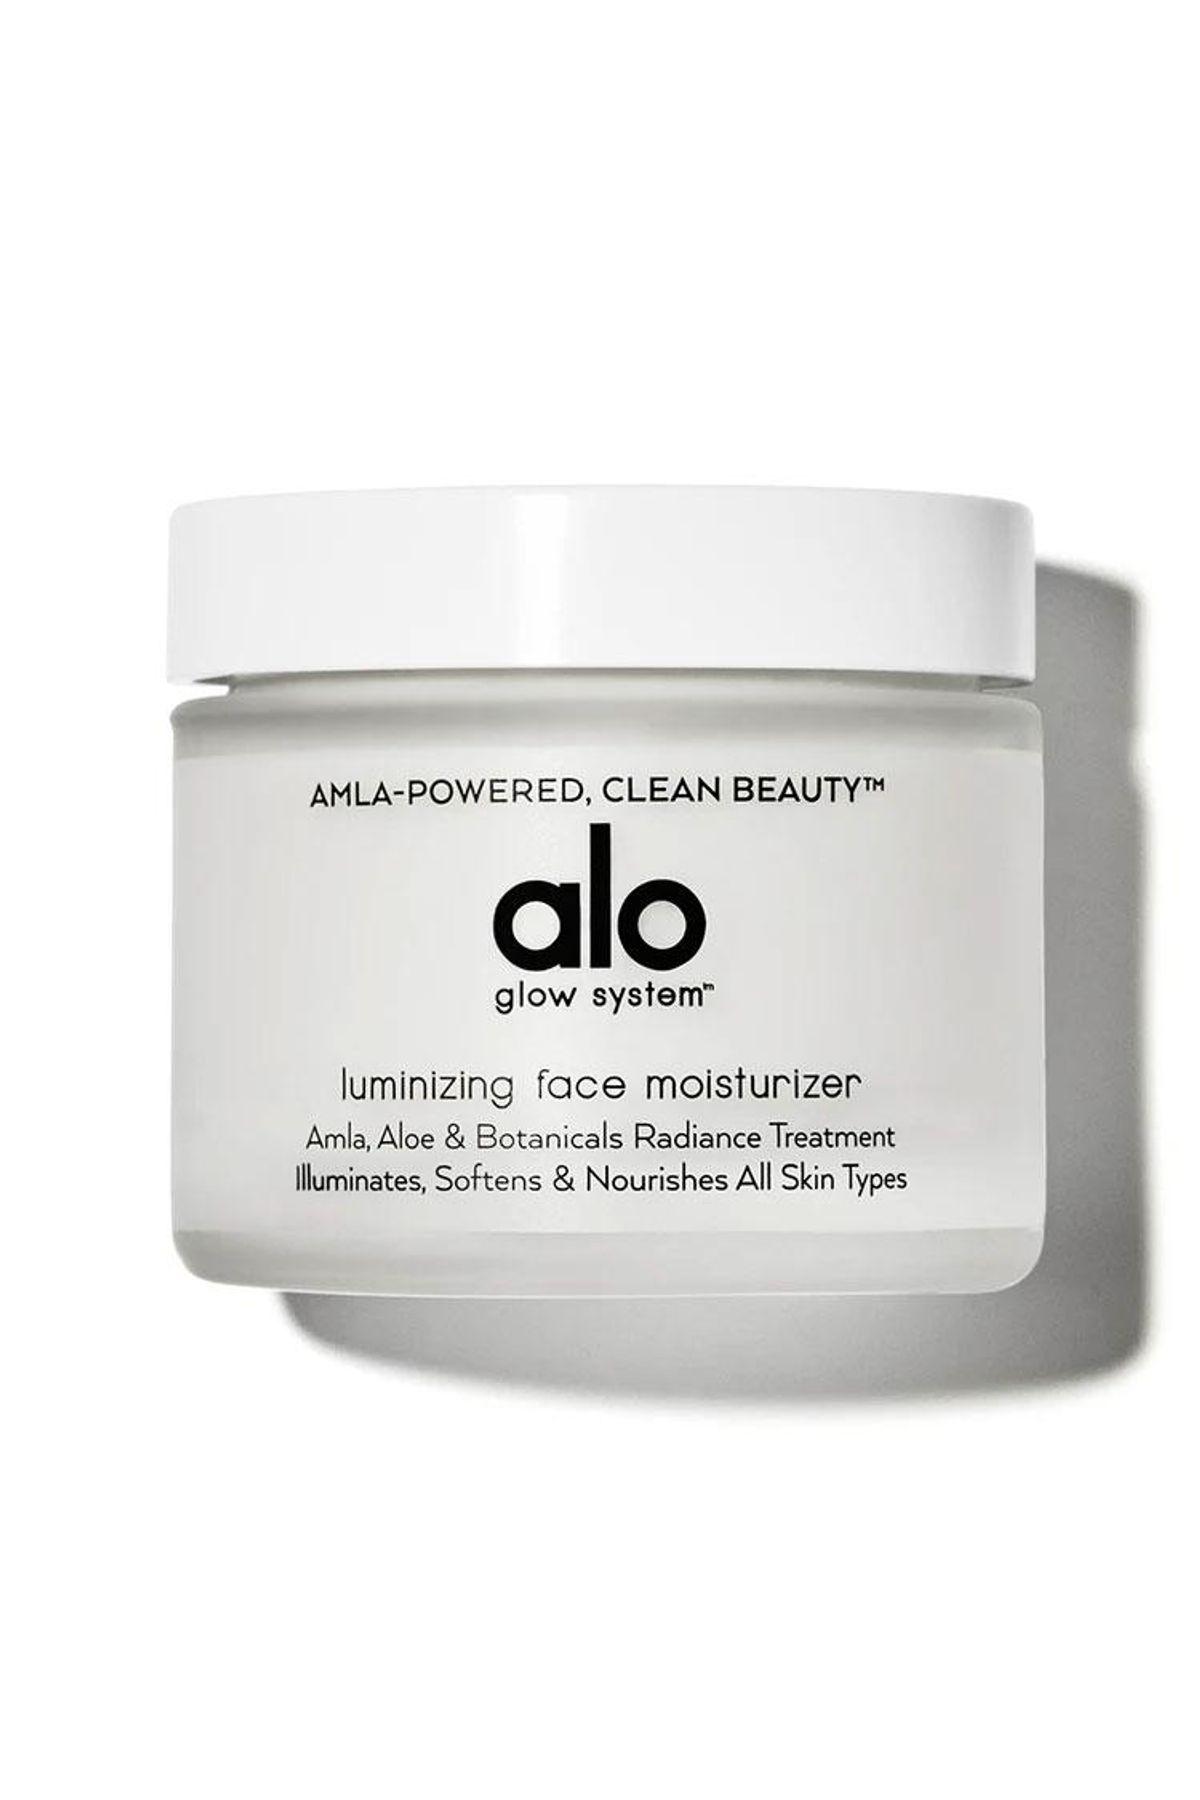 alo luminizing facial moisturizer